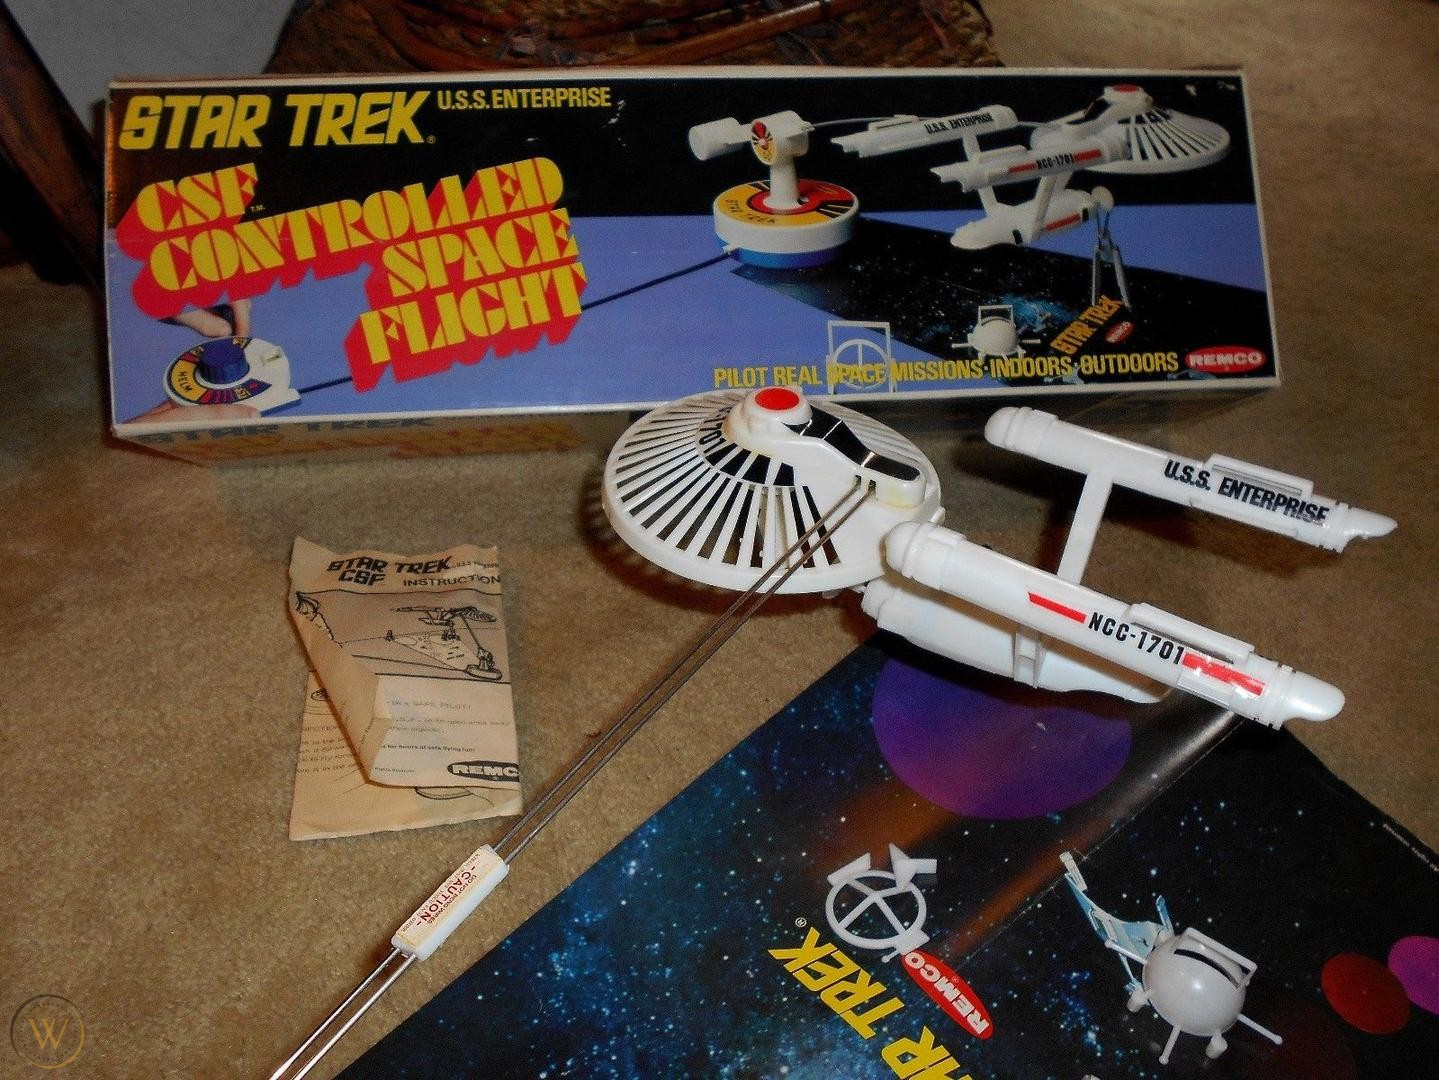 remco-1976-star-trek-csf-vertibird_1_9ea6bae844ba4231eb13256bf1552ff2.jpg